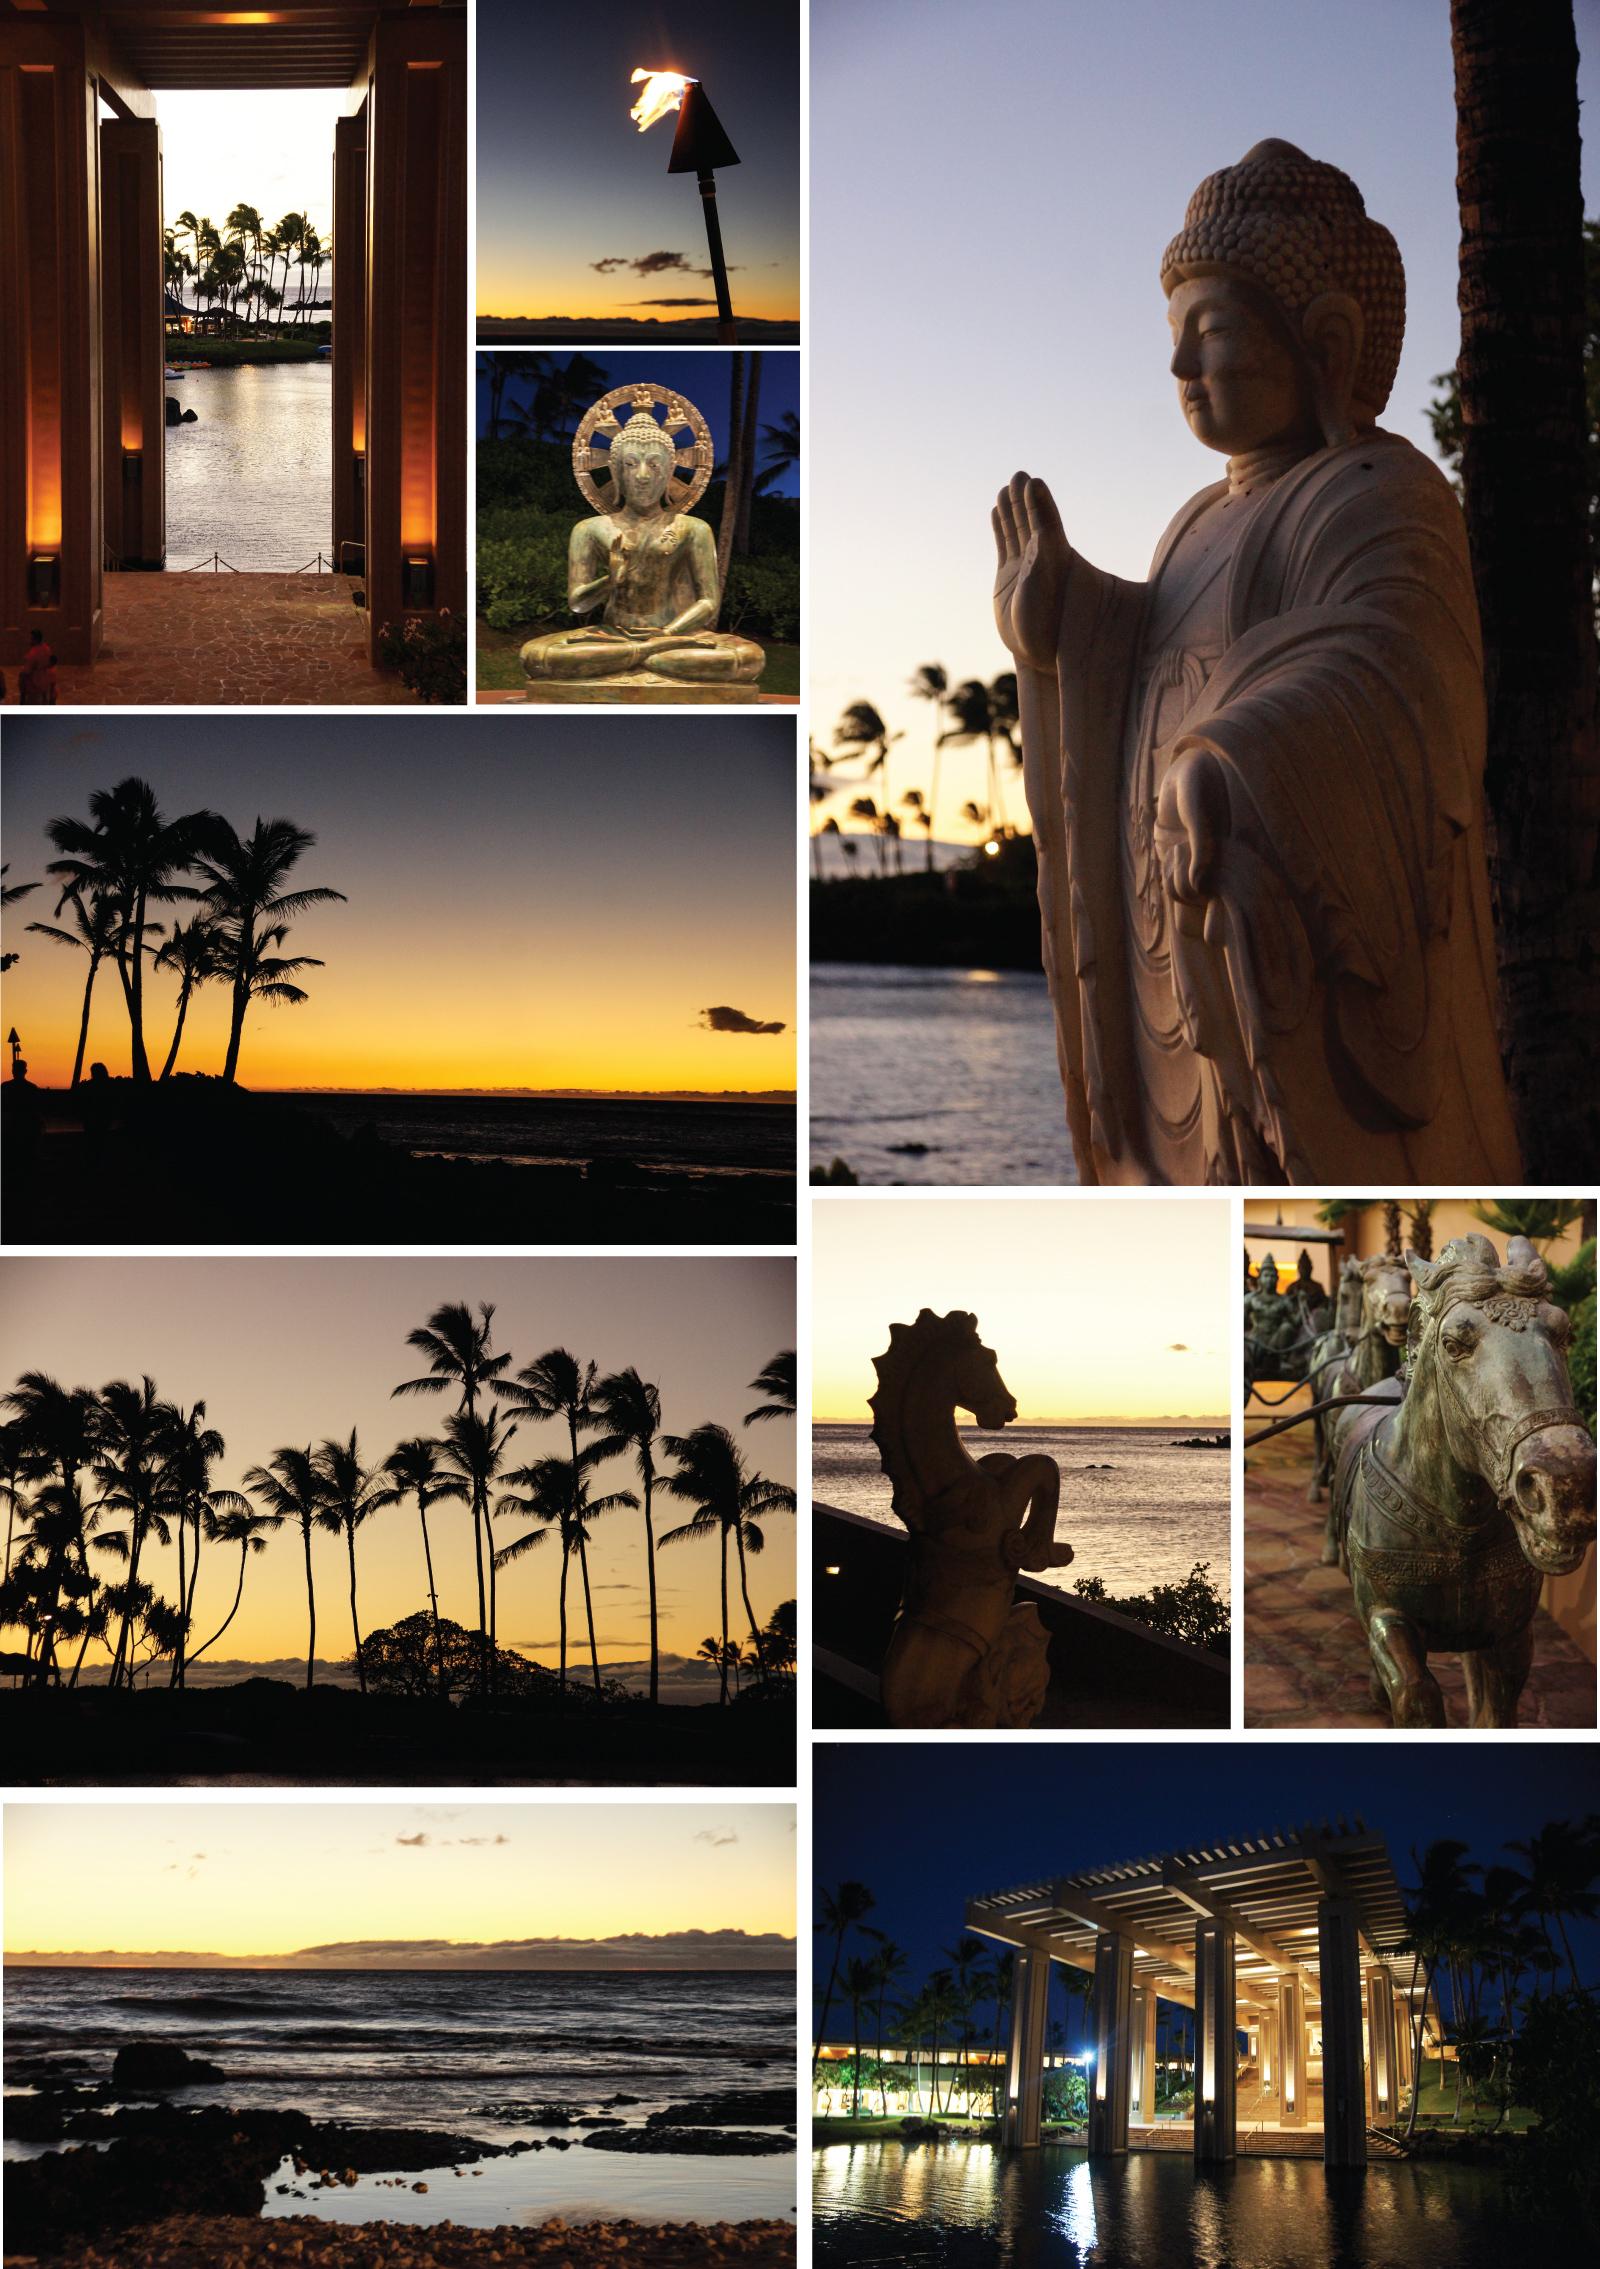 Night falls on paradise... Waikoloa, Hawaii.